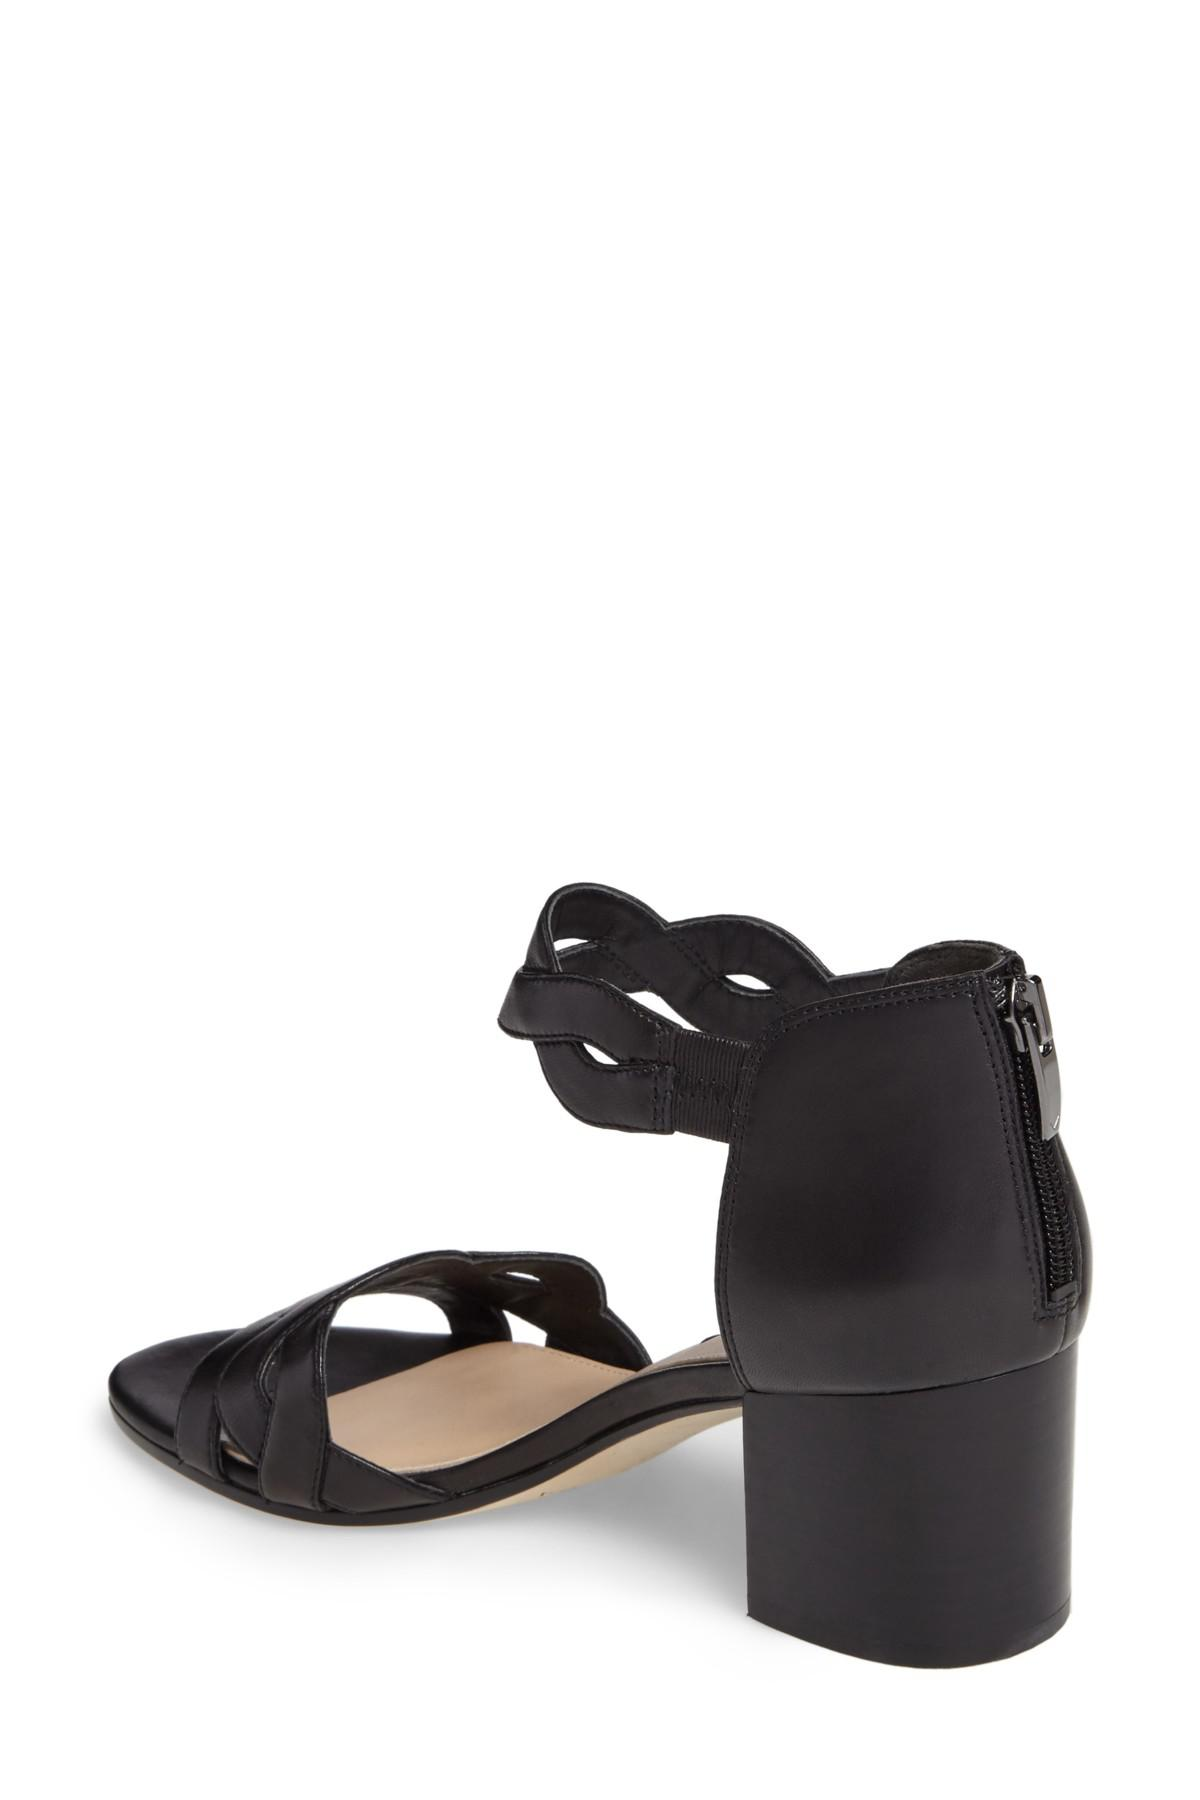 fbe300961c83 Lyst - Via Spiga Janel Block Heel Sandal in Black